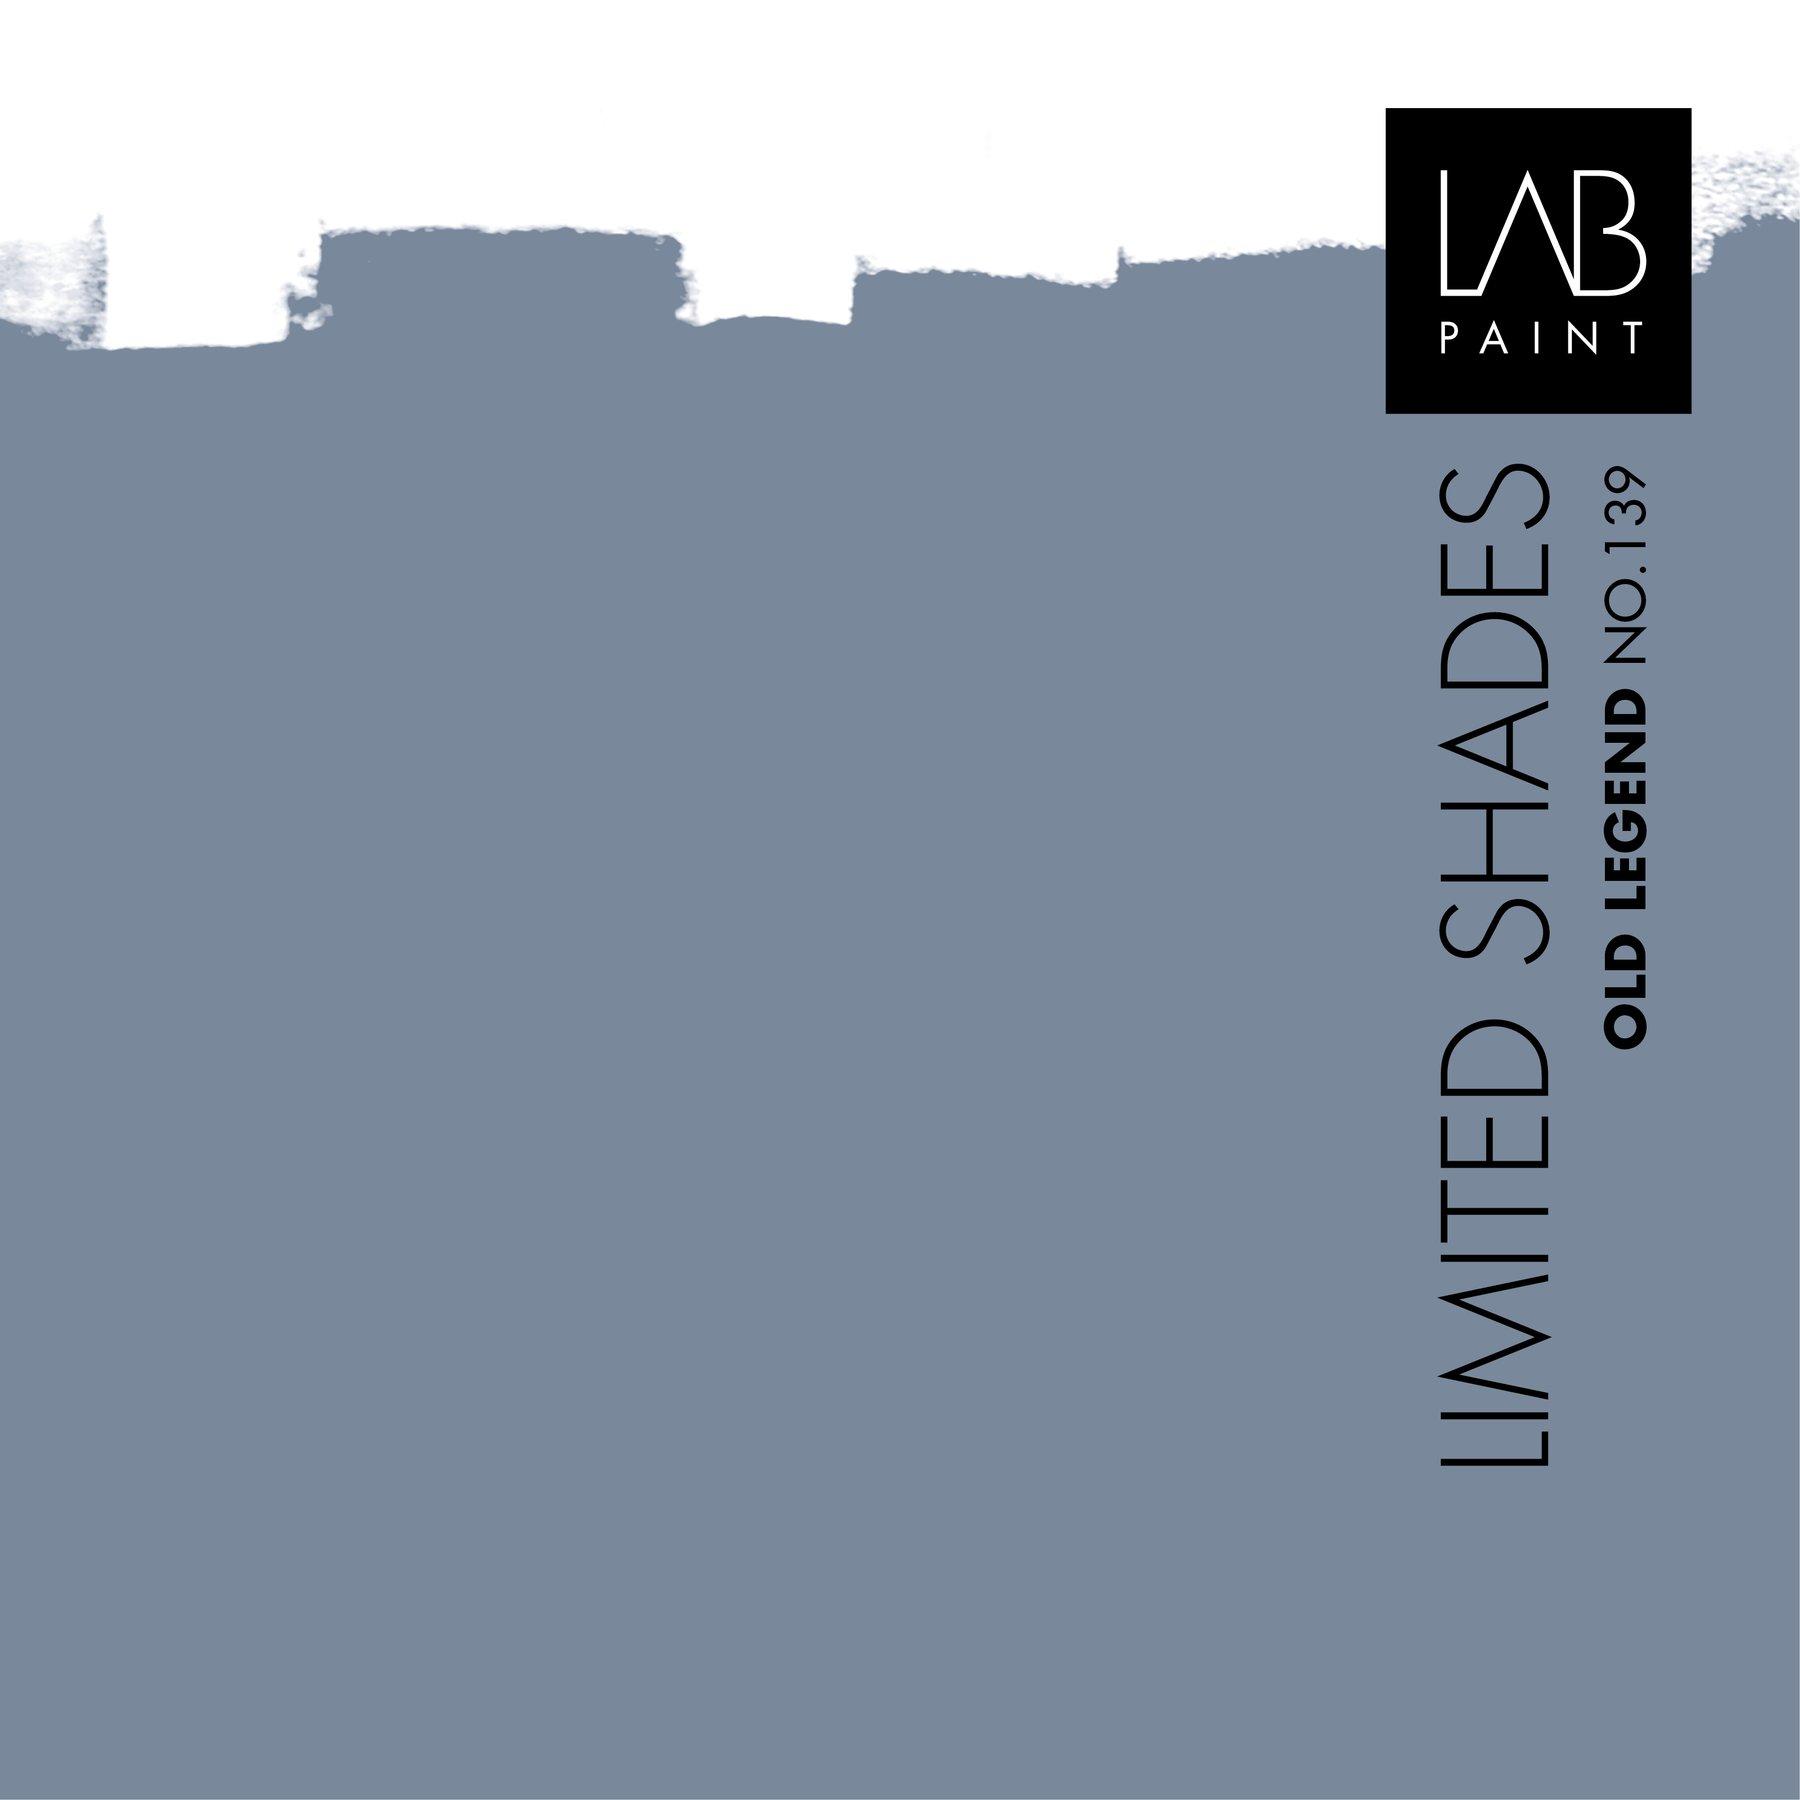 LAB_Kleuren_WEB_LIMITEDSHADES_OldLegendn